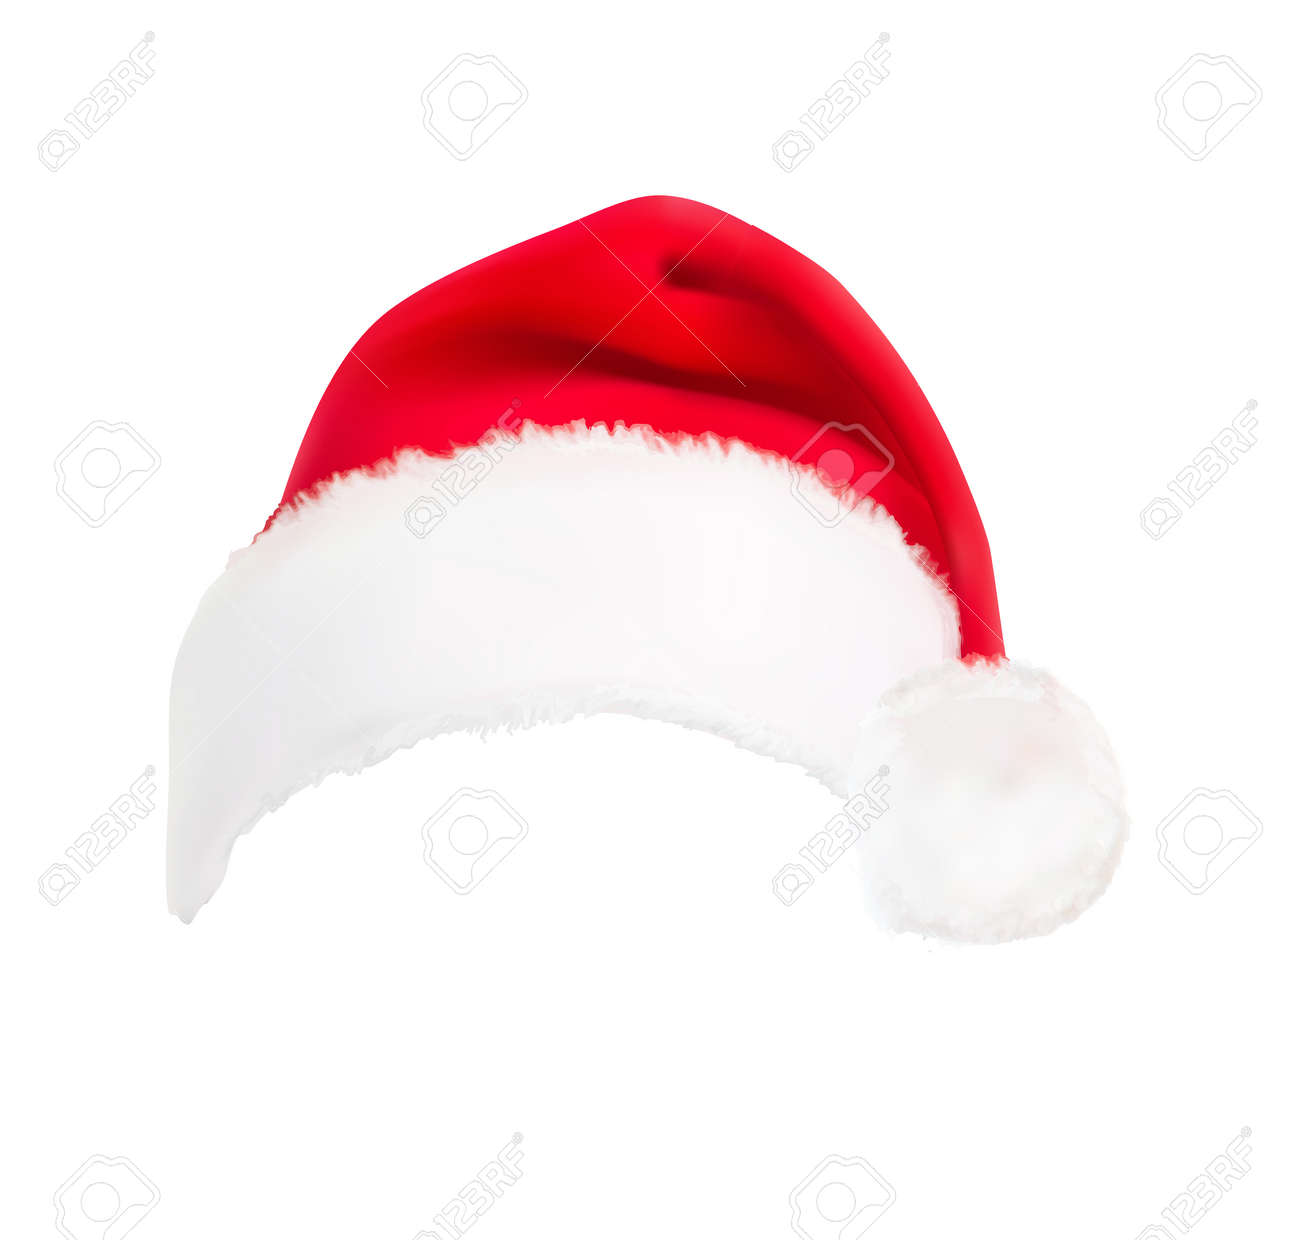 red santa hat vector royalty free cliparts vectors and stock rh 123rf com santa claus hat vector free download santa hat vector art free